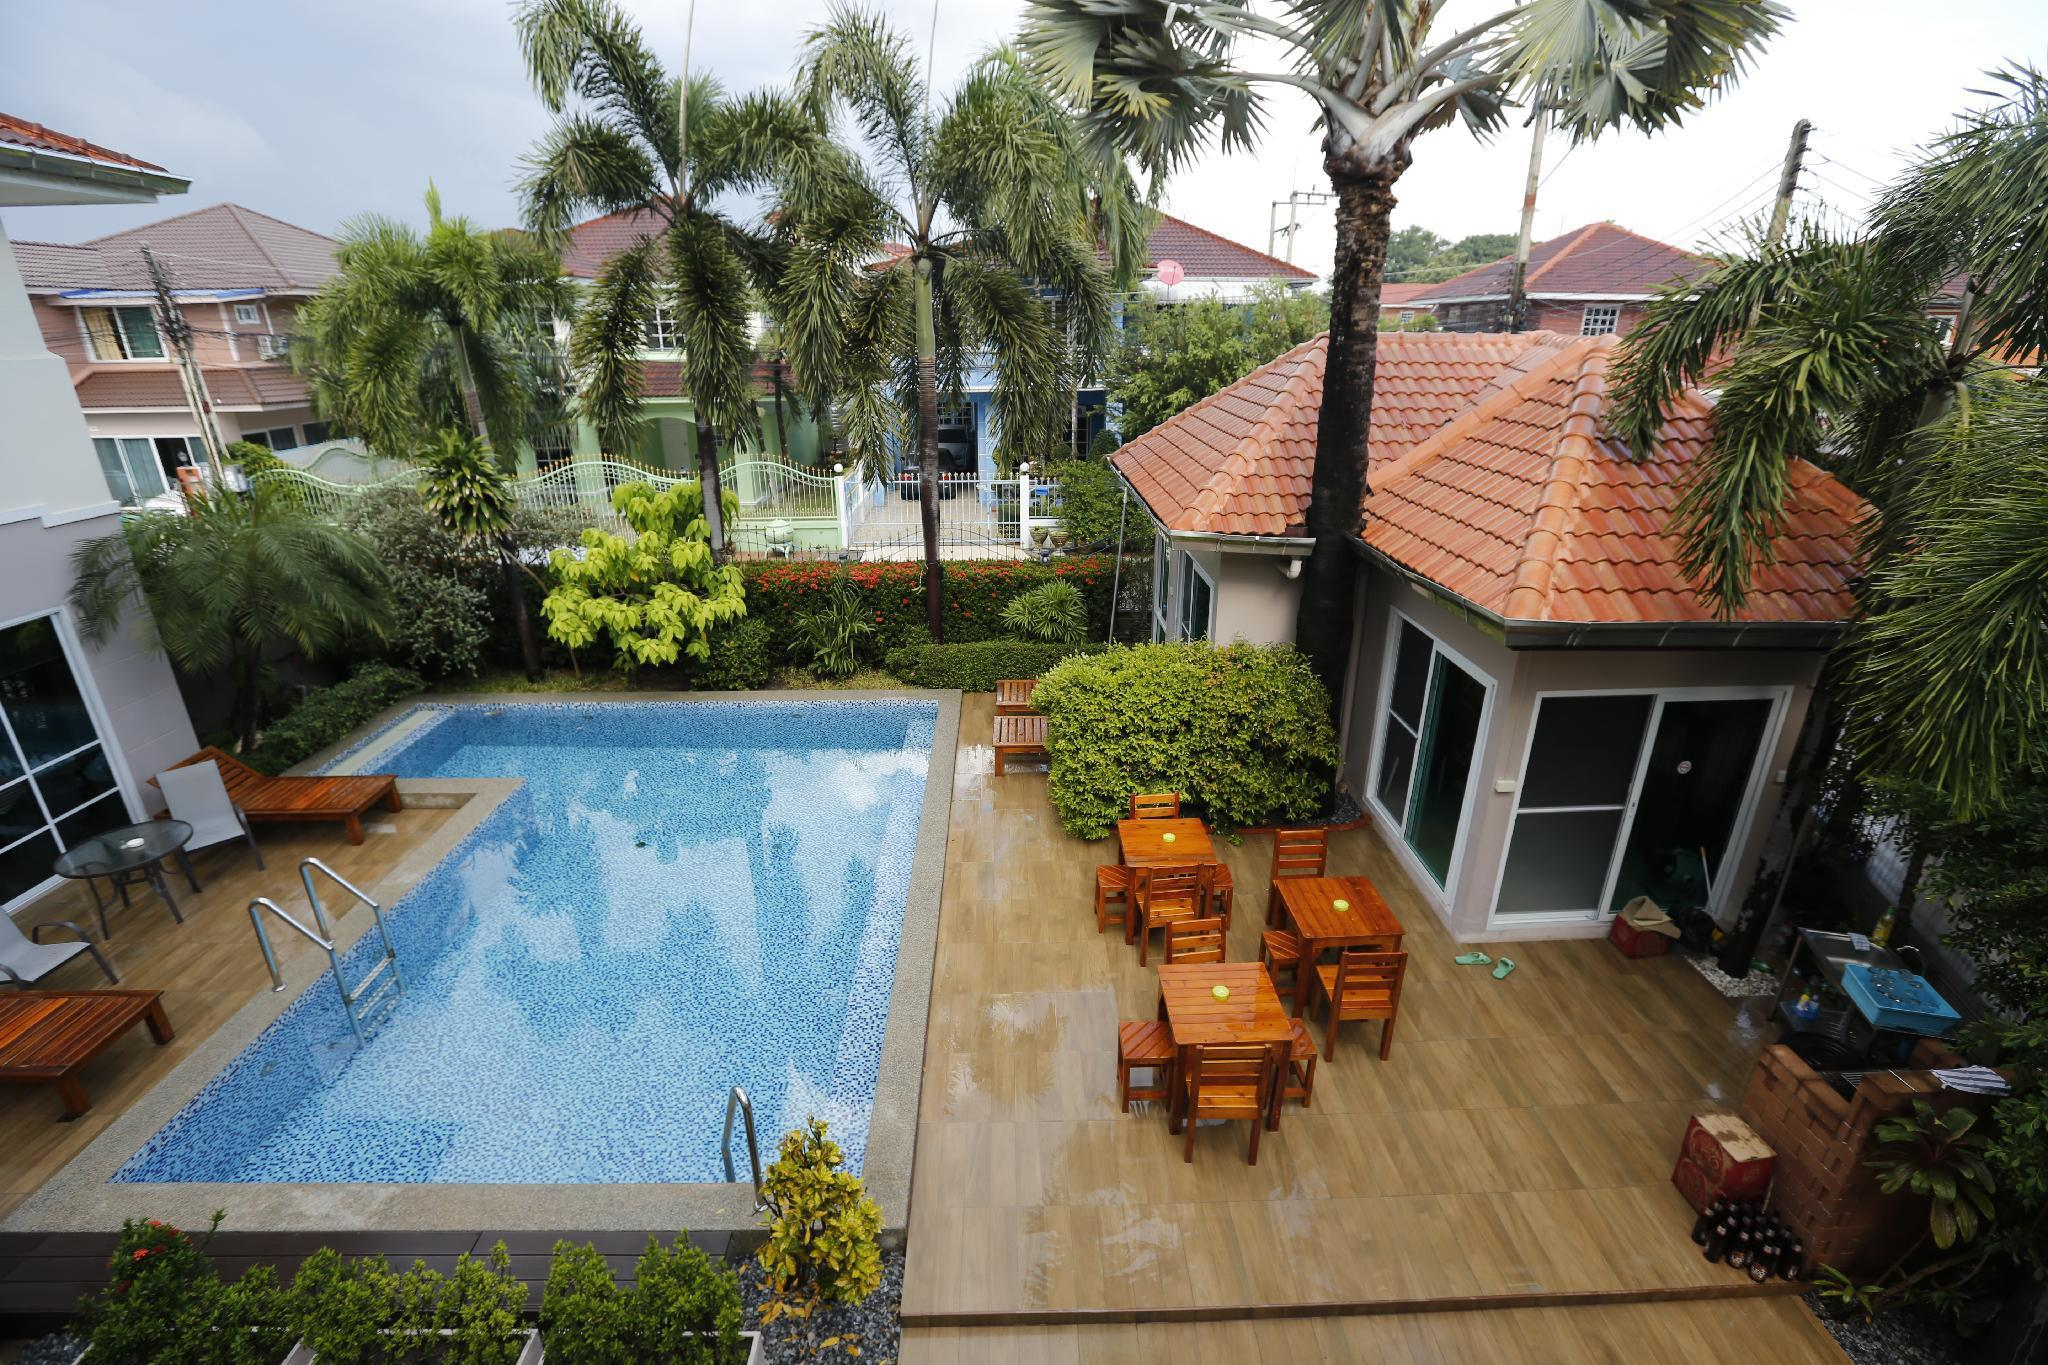 8 Bedroom Pool Villa in Downtown Pattaya วิลลา 8 ห้องนอน 7 ห้องน้ำส่วนตัว ขนาด 650 ตร.ม. – หาดจอมเทียน